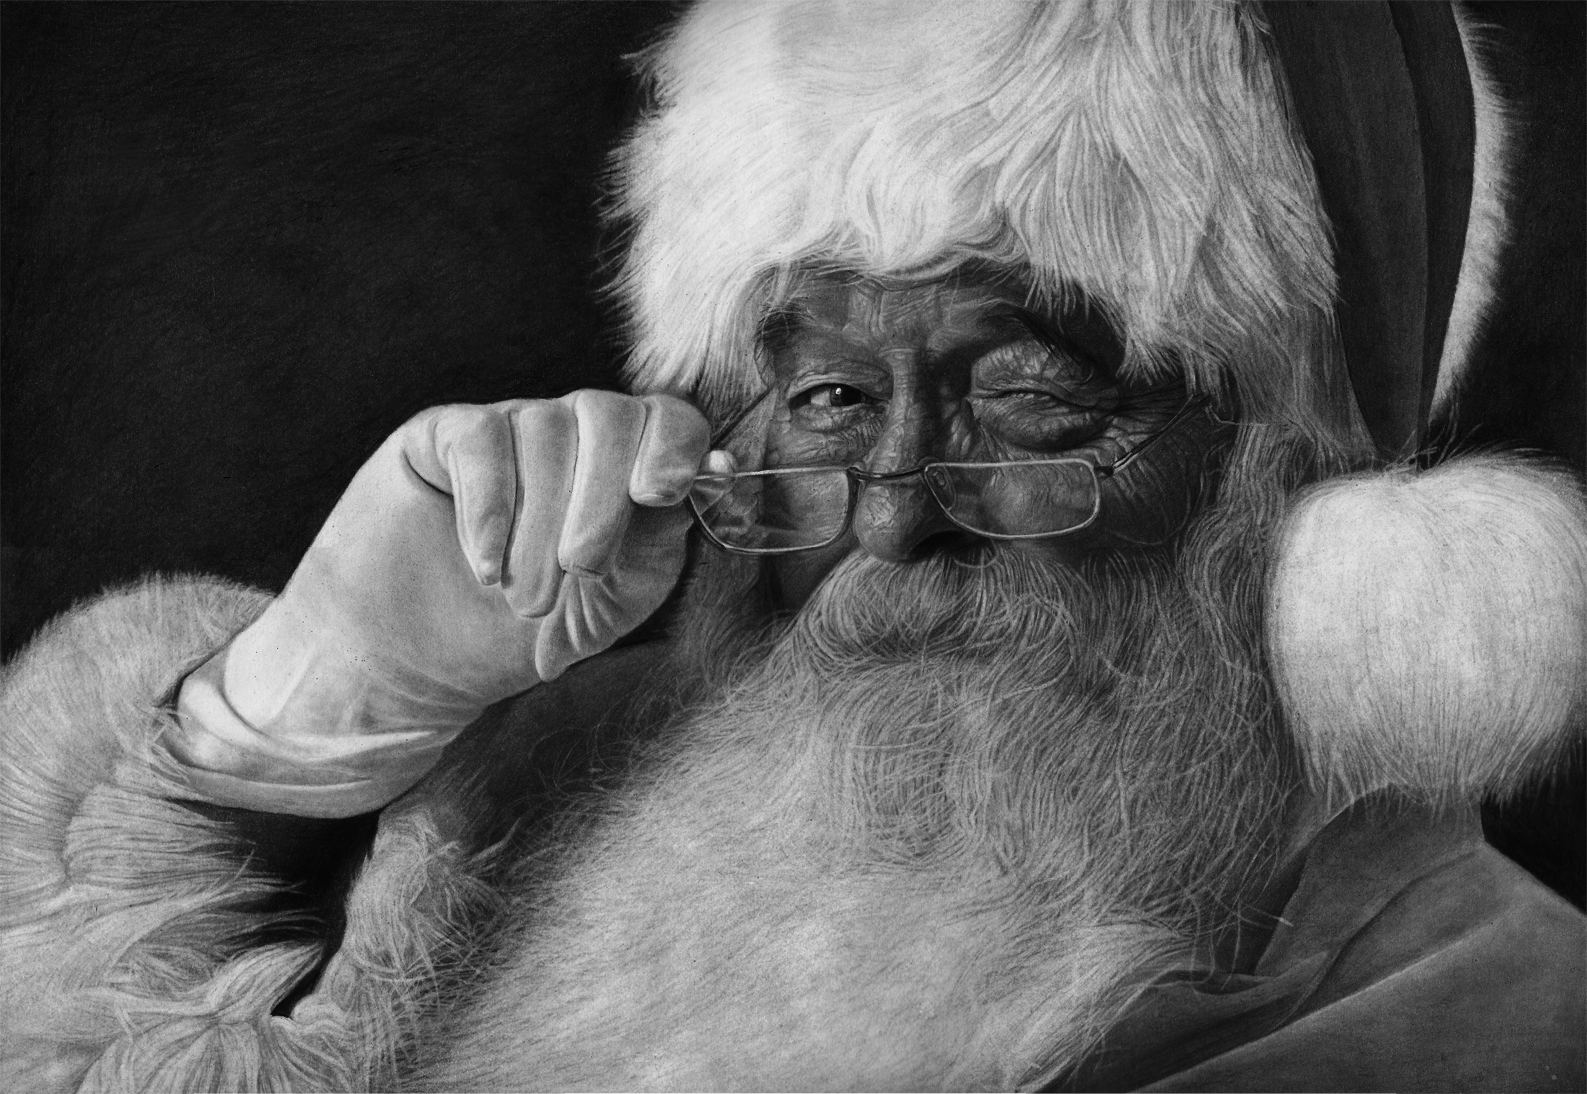 Father Christmas (Santa Claus) | Pencil Drawing